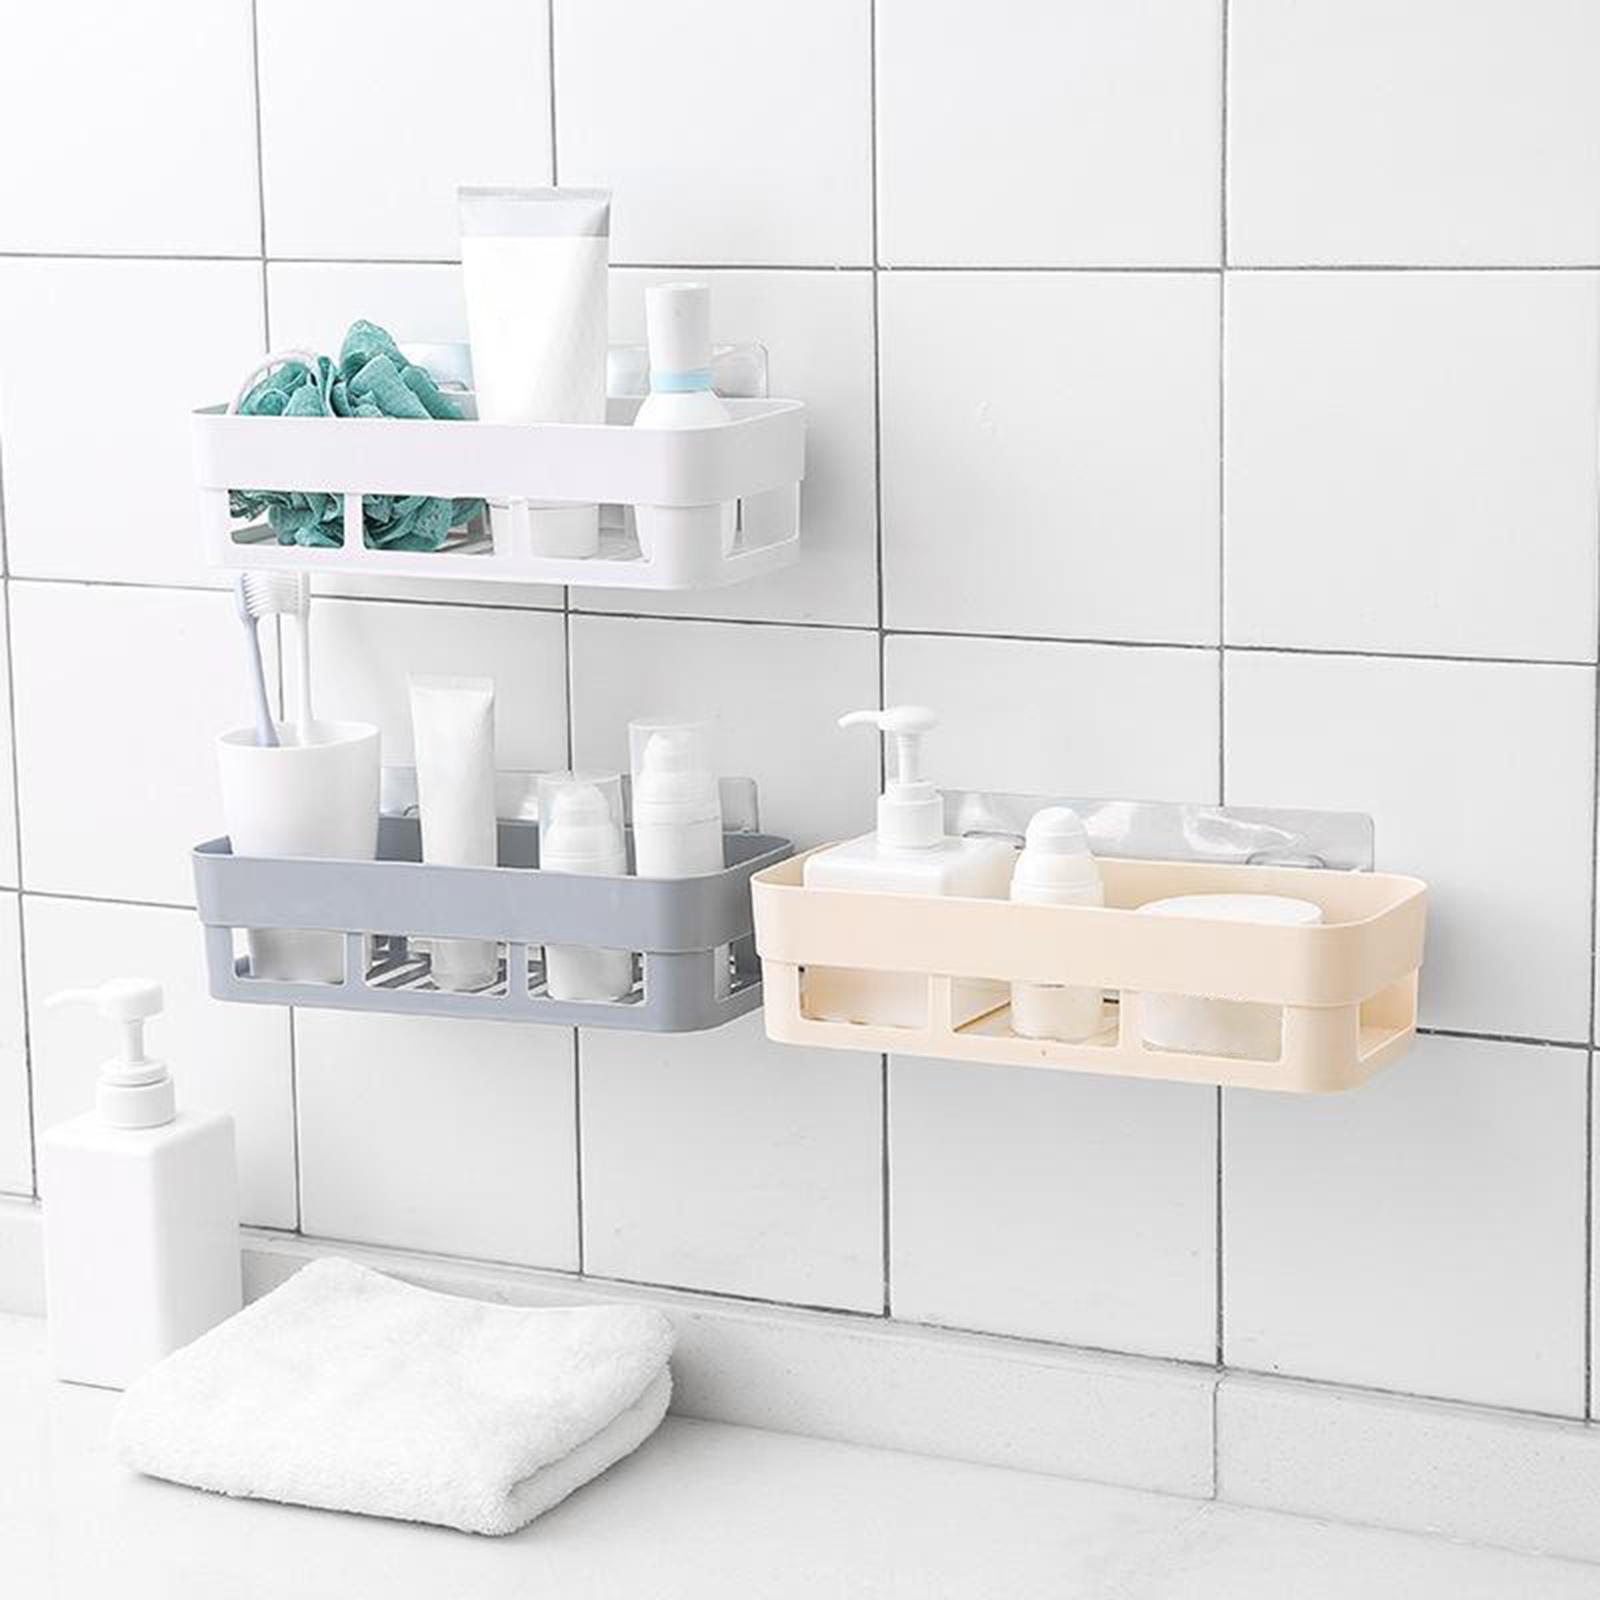 thumbnail 26 - Wall-Suction-Bathroom-Shelf-Shower-Caddy-Wall-Mount-Storage-Rack-Organizer